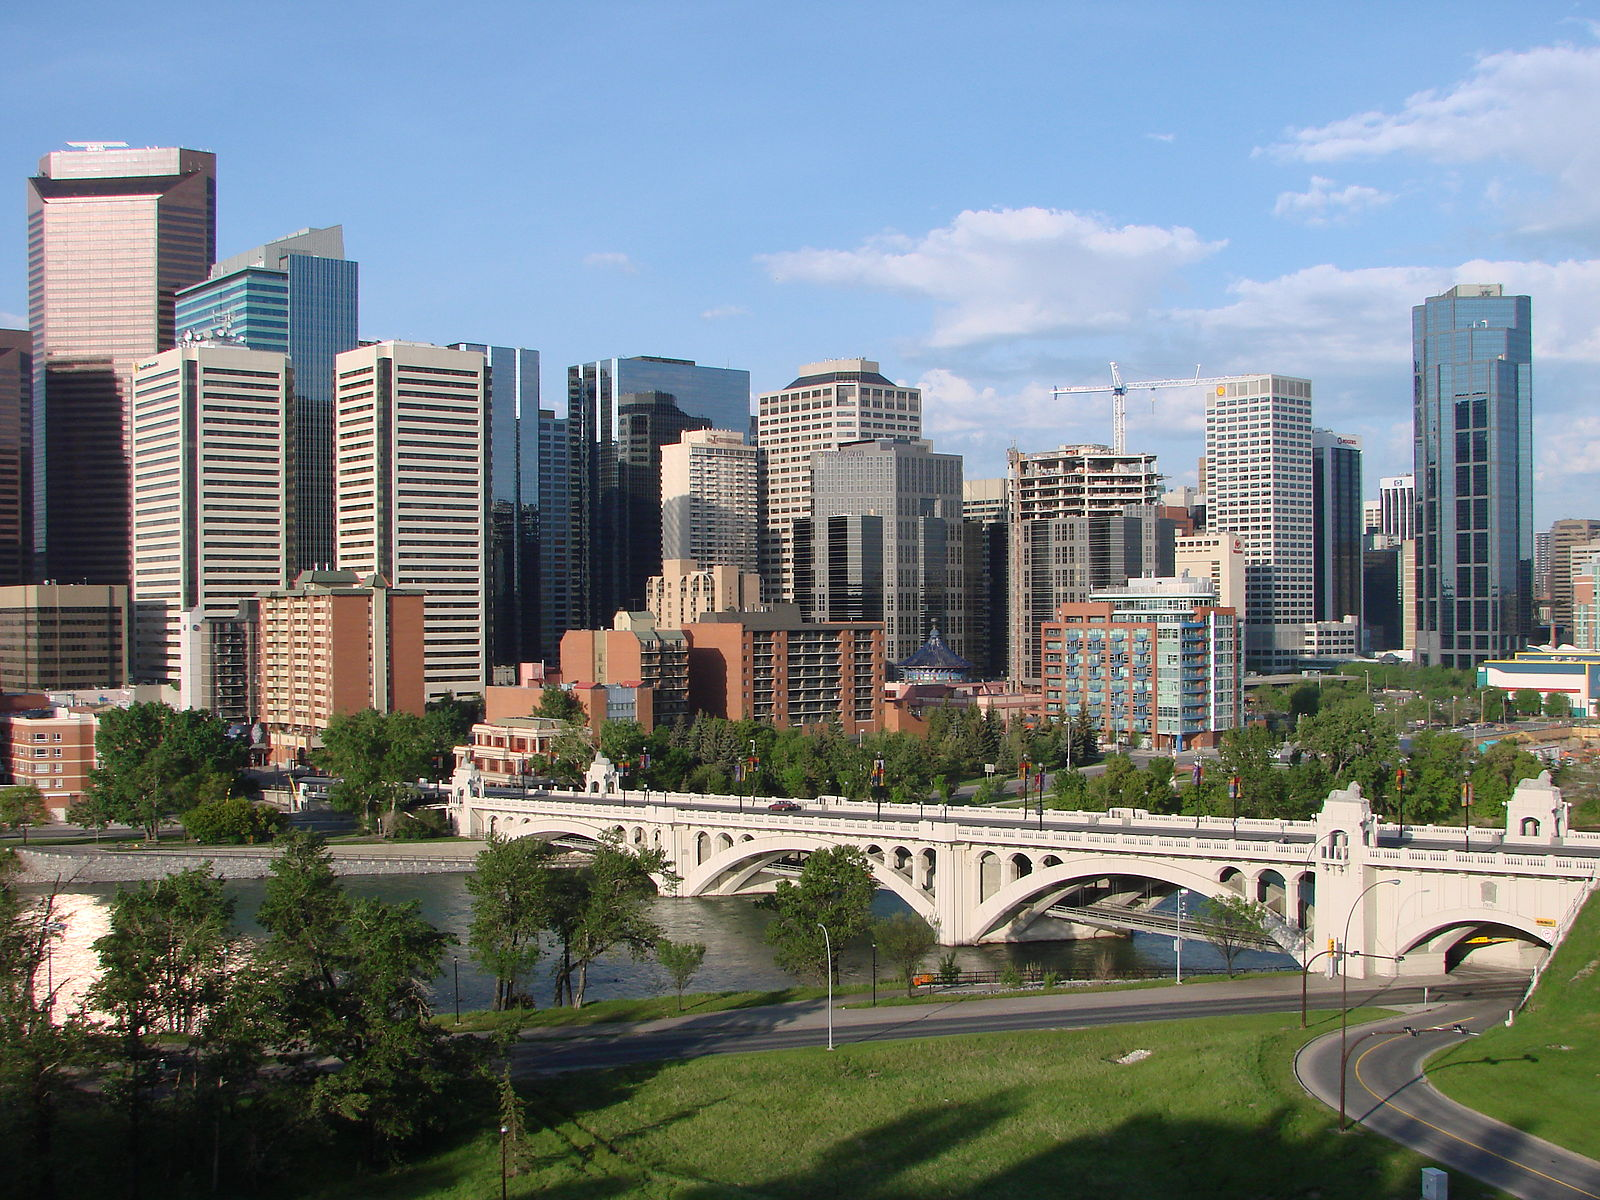 1600px-Downtown_Calgary.jpg